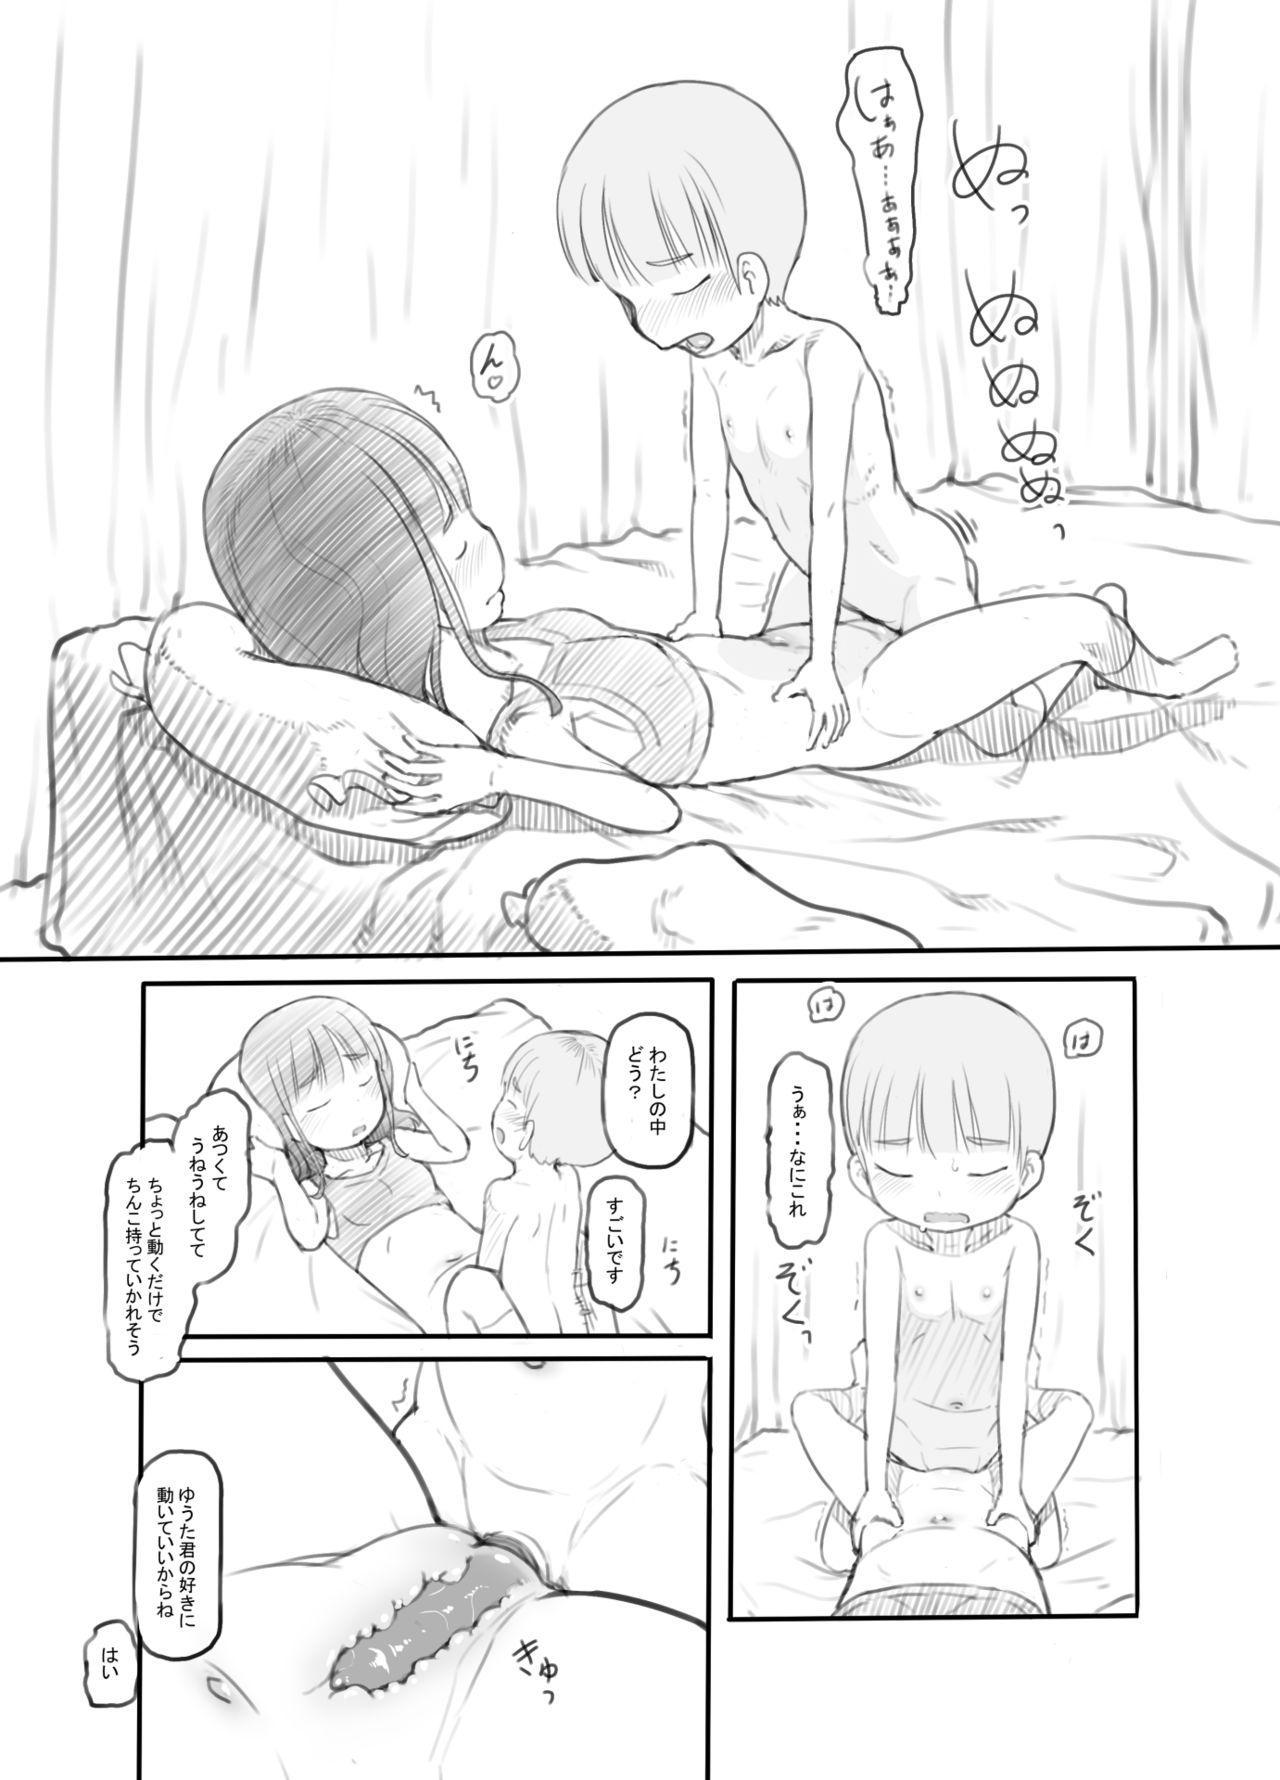 OneShota Sex Jisshuu 19